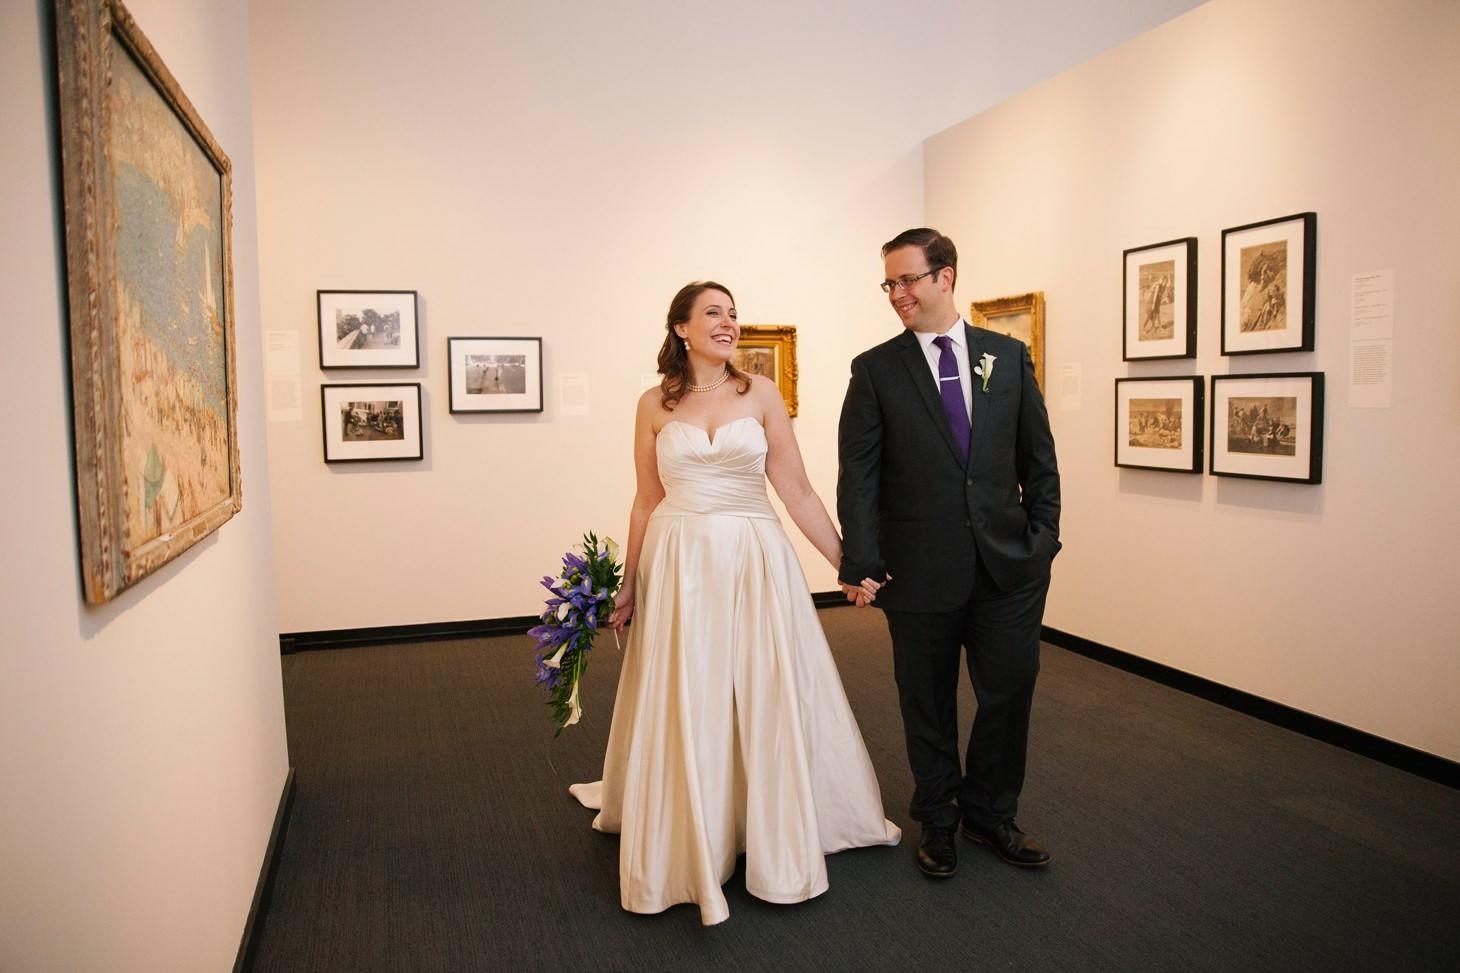 047-nyc-wedding-photographer-hoboken-waterfront-wedding-photos-smitten-chickens.jpg